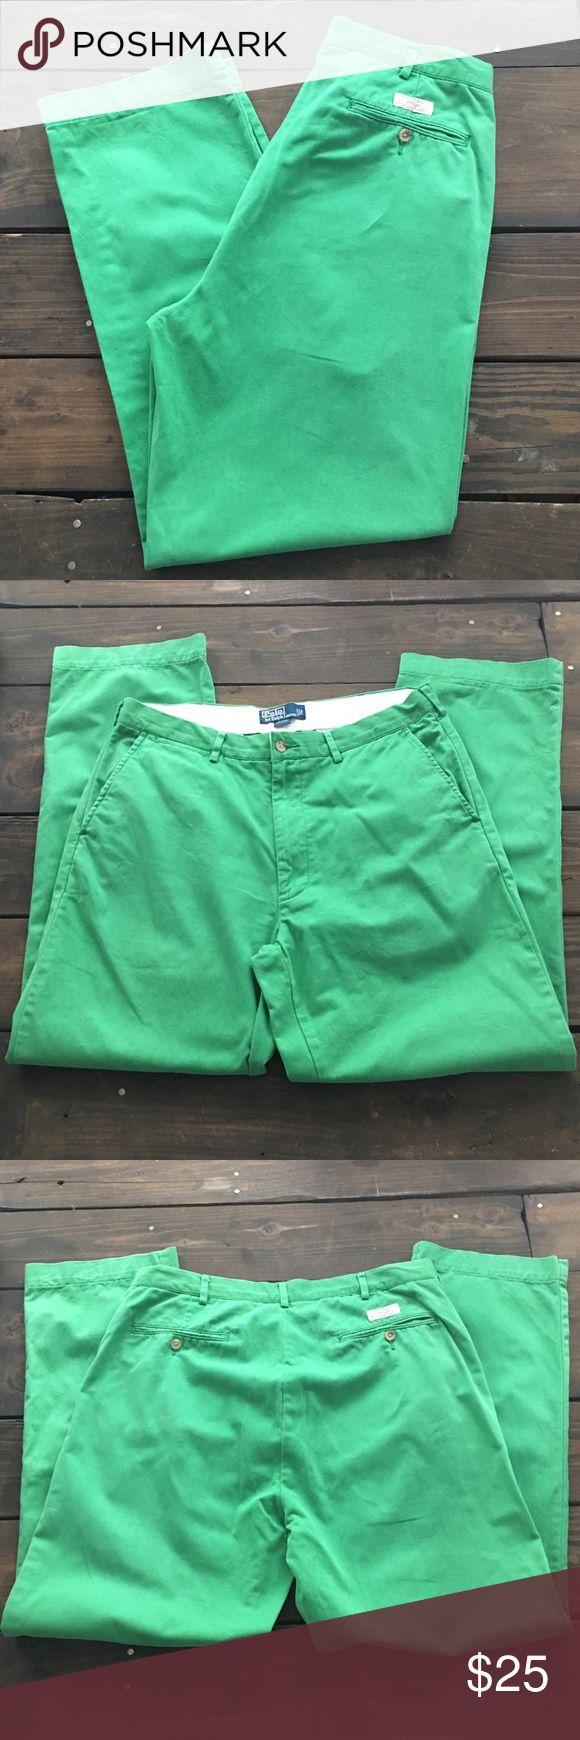 "EUC Men's Polo Ralph Lauren Green Chino Pants Excellent Men's Green Flat Front Chino Pants Polo Ralph Lauren Size 35/32 17"" Waist measured flat Polo by Ralph Lauren Pants Chinos & Khakis"